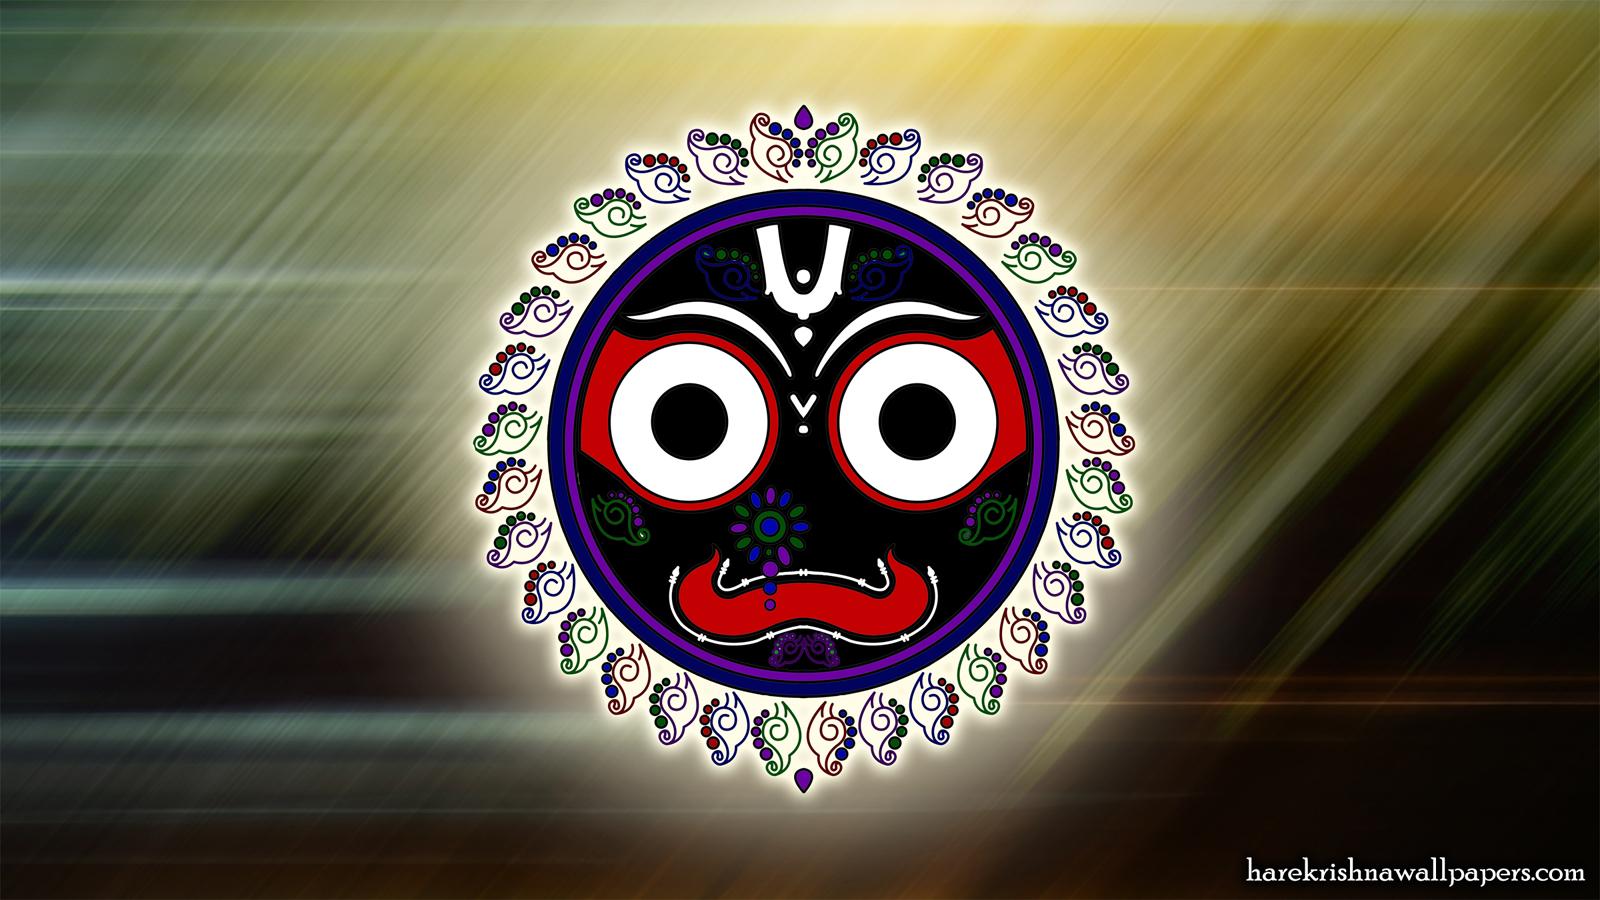 Jai Jagannath Wallpaper (037) Size 1600x900 Download